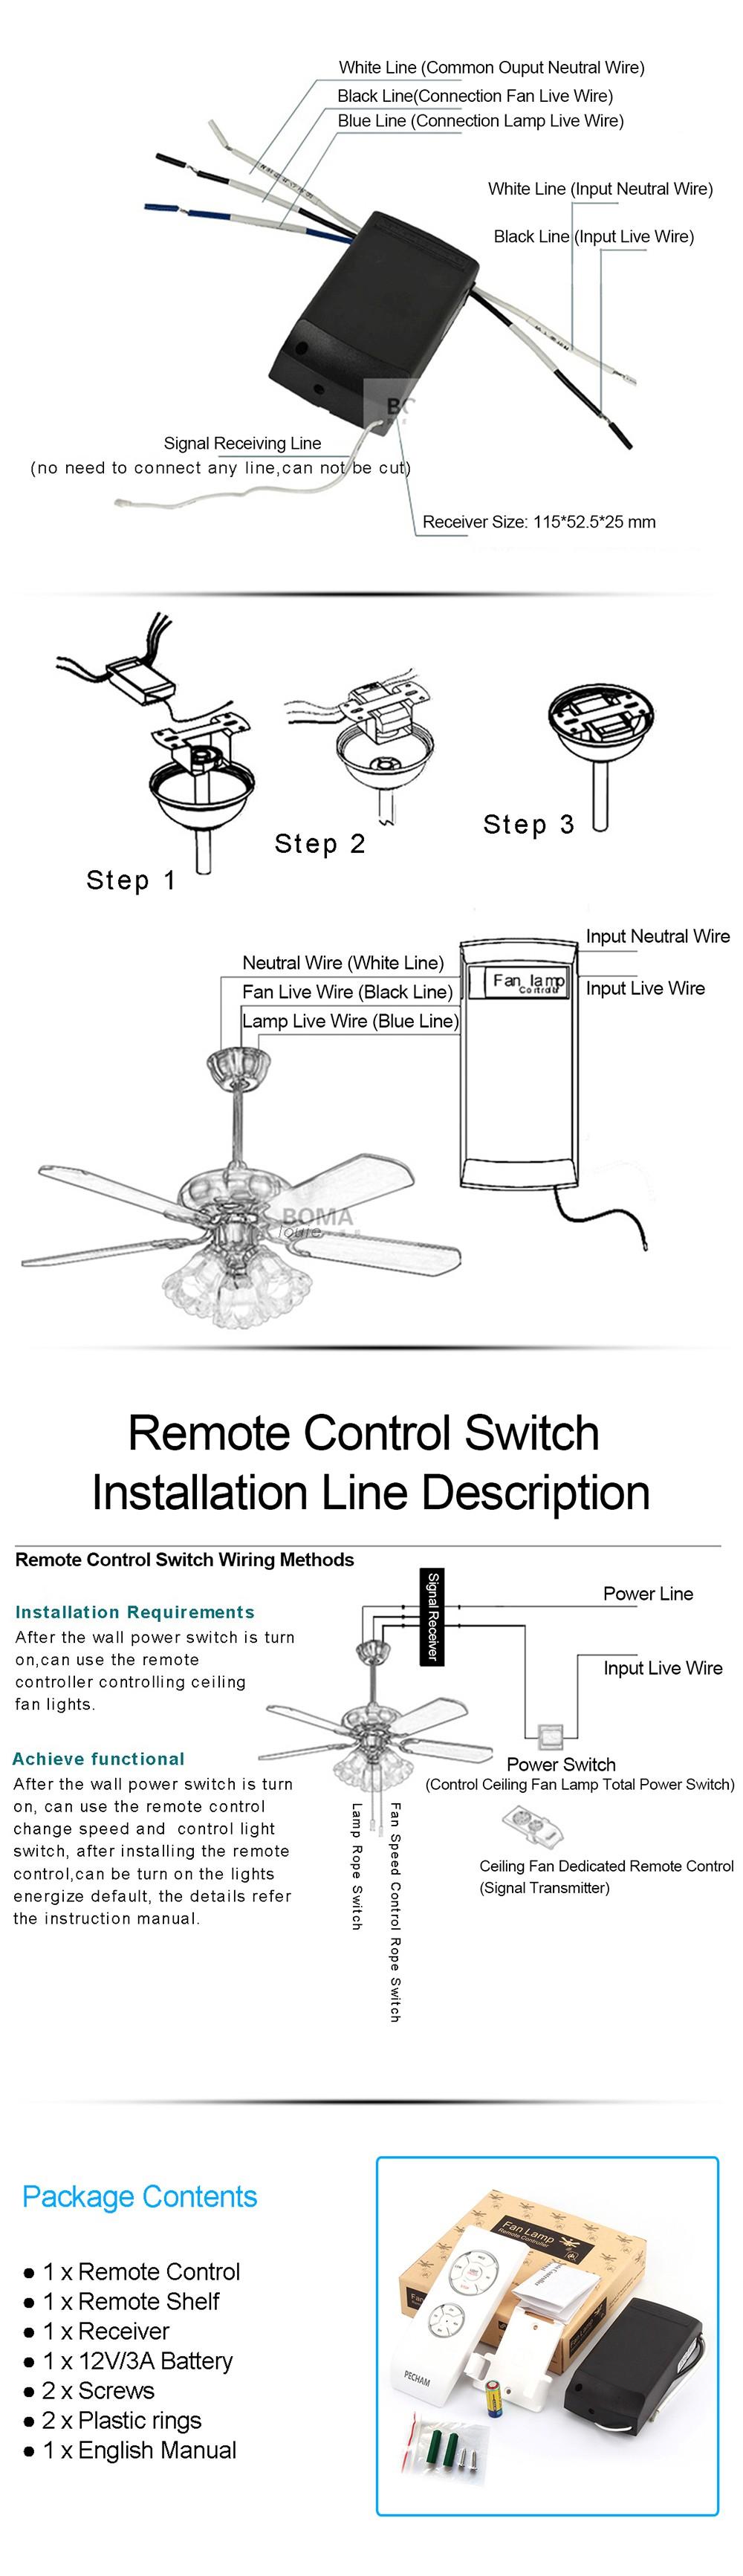 Pecham Universal Remote Control For Ceiling Fan Timing Ceilingfanwiringremote1powerwirejpg 01 02 03 04